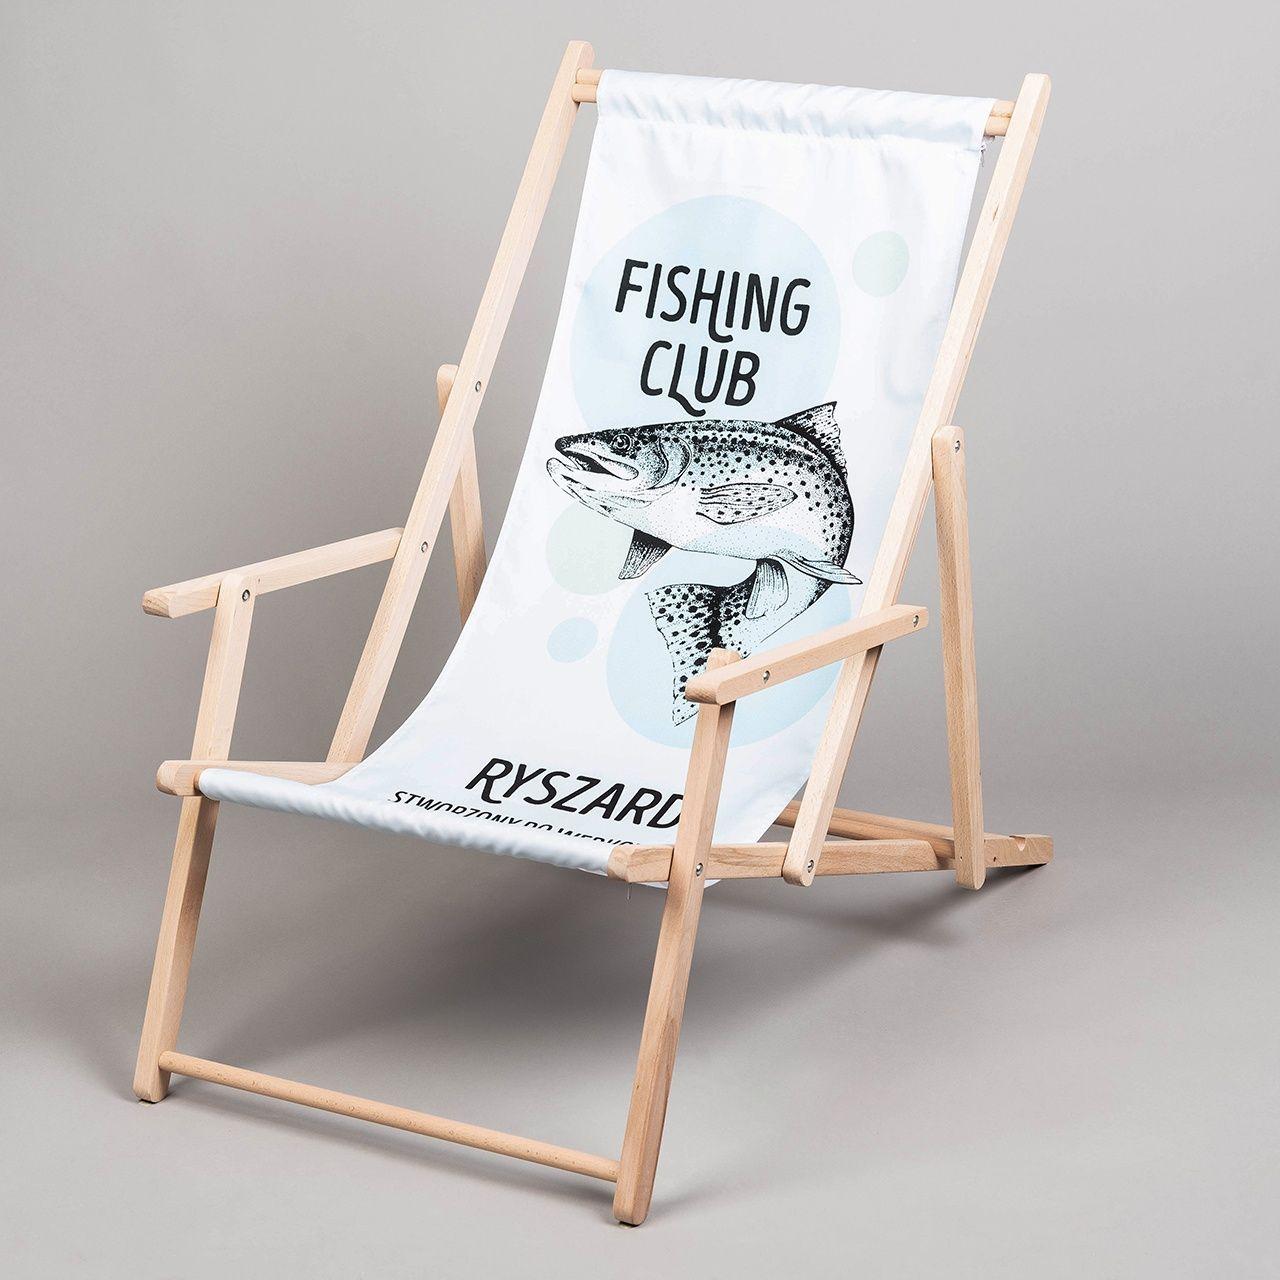 Lezak Fishing Club Crazyshop Pl Lezak Lezakfishing